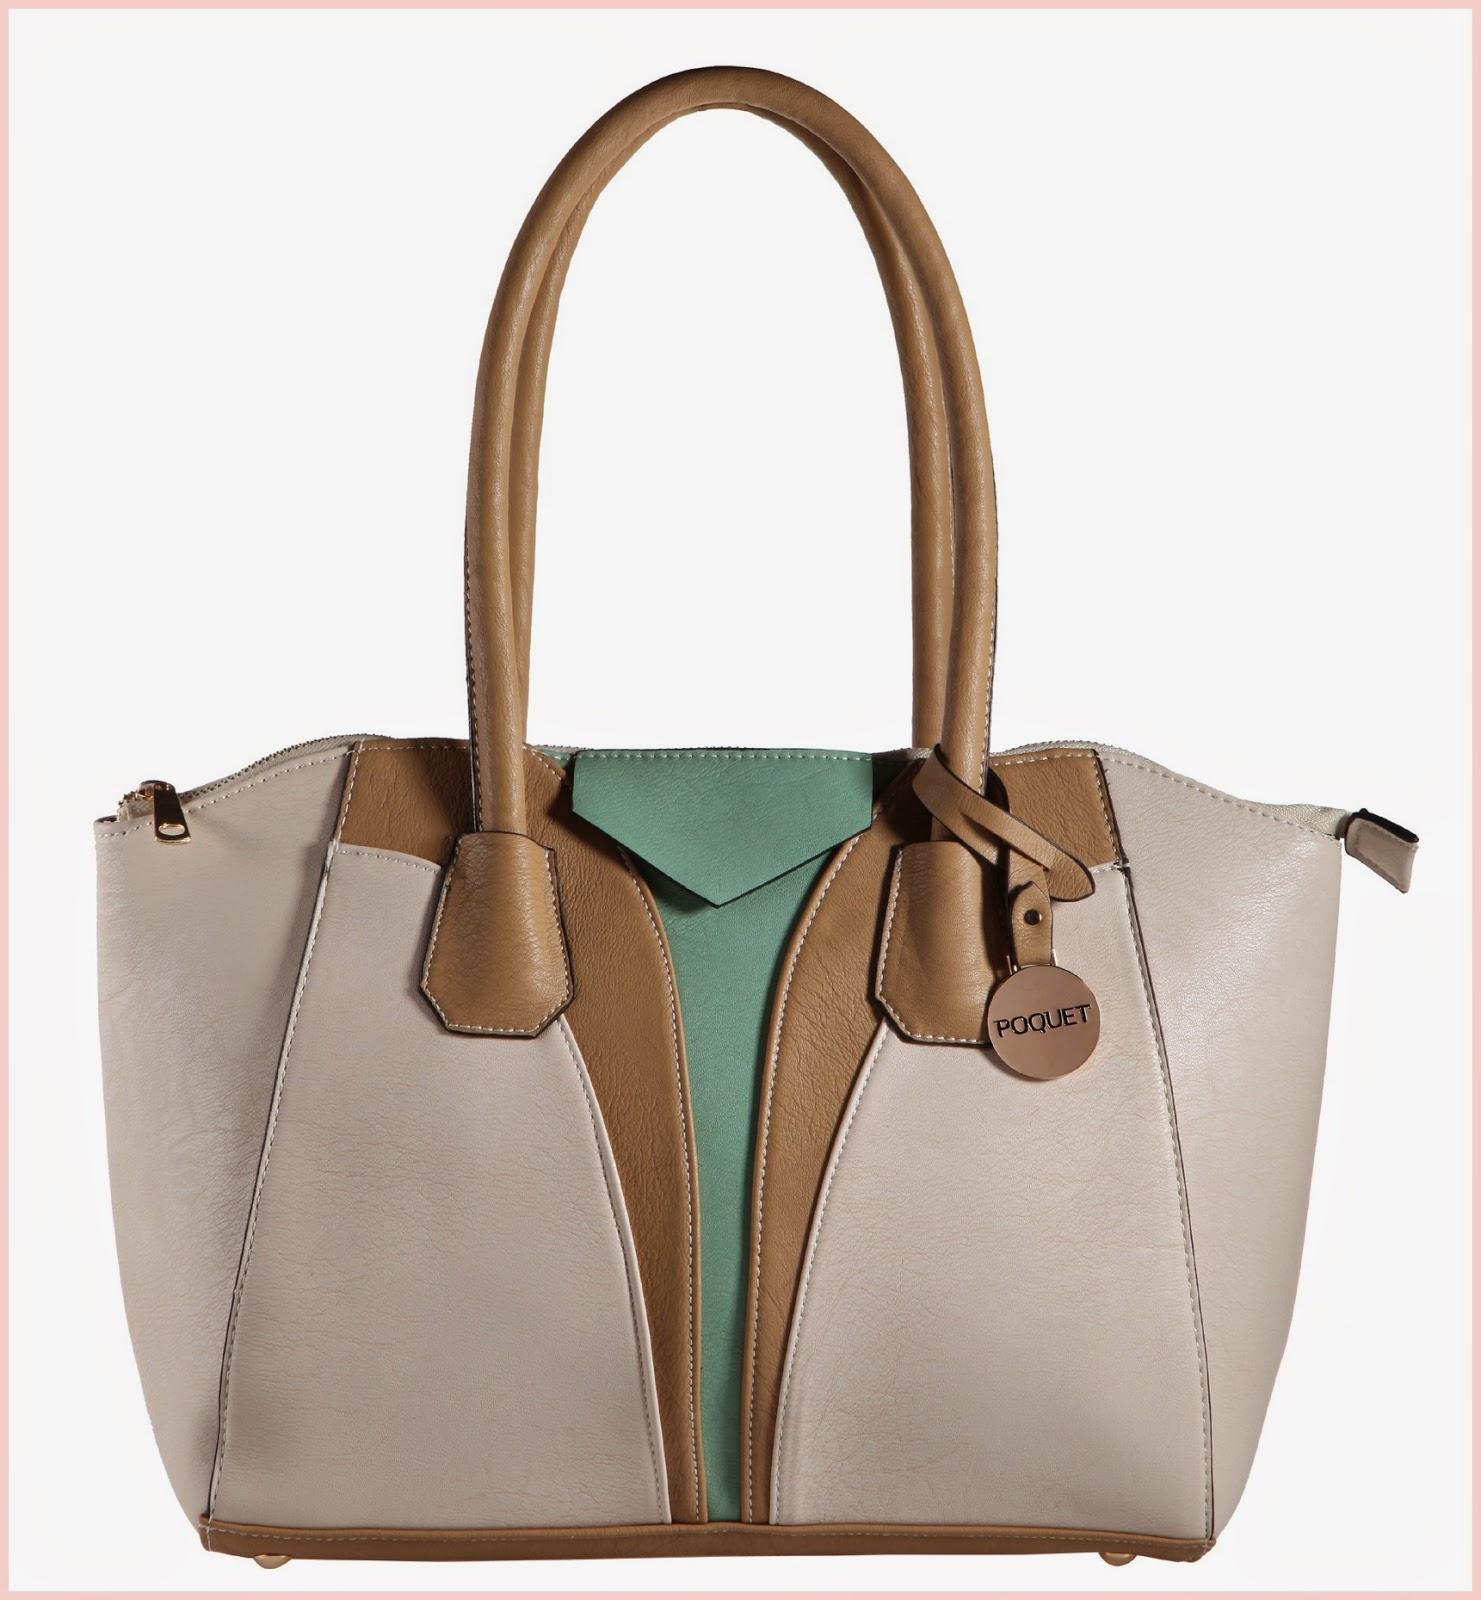 http://www.portaldabolsa.com.br/produto-631/bolsa-de-ombro/bolsa-de-ombro-feminina-novo-color-blocking-023sbb